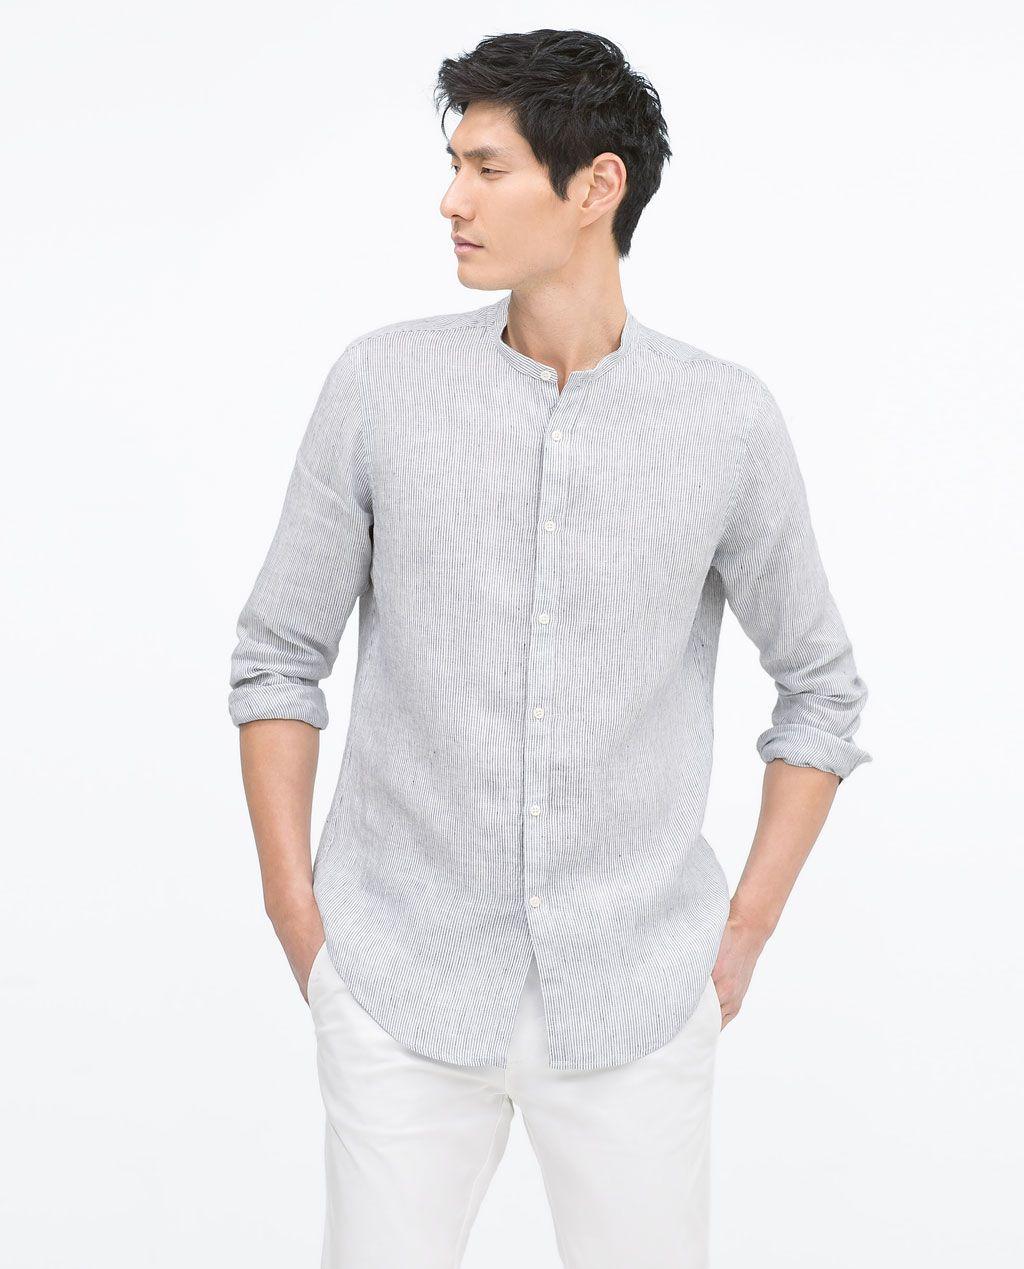 Zara black t shirt india - Image 1 Of Linen Shirt From Zara